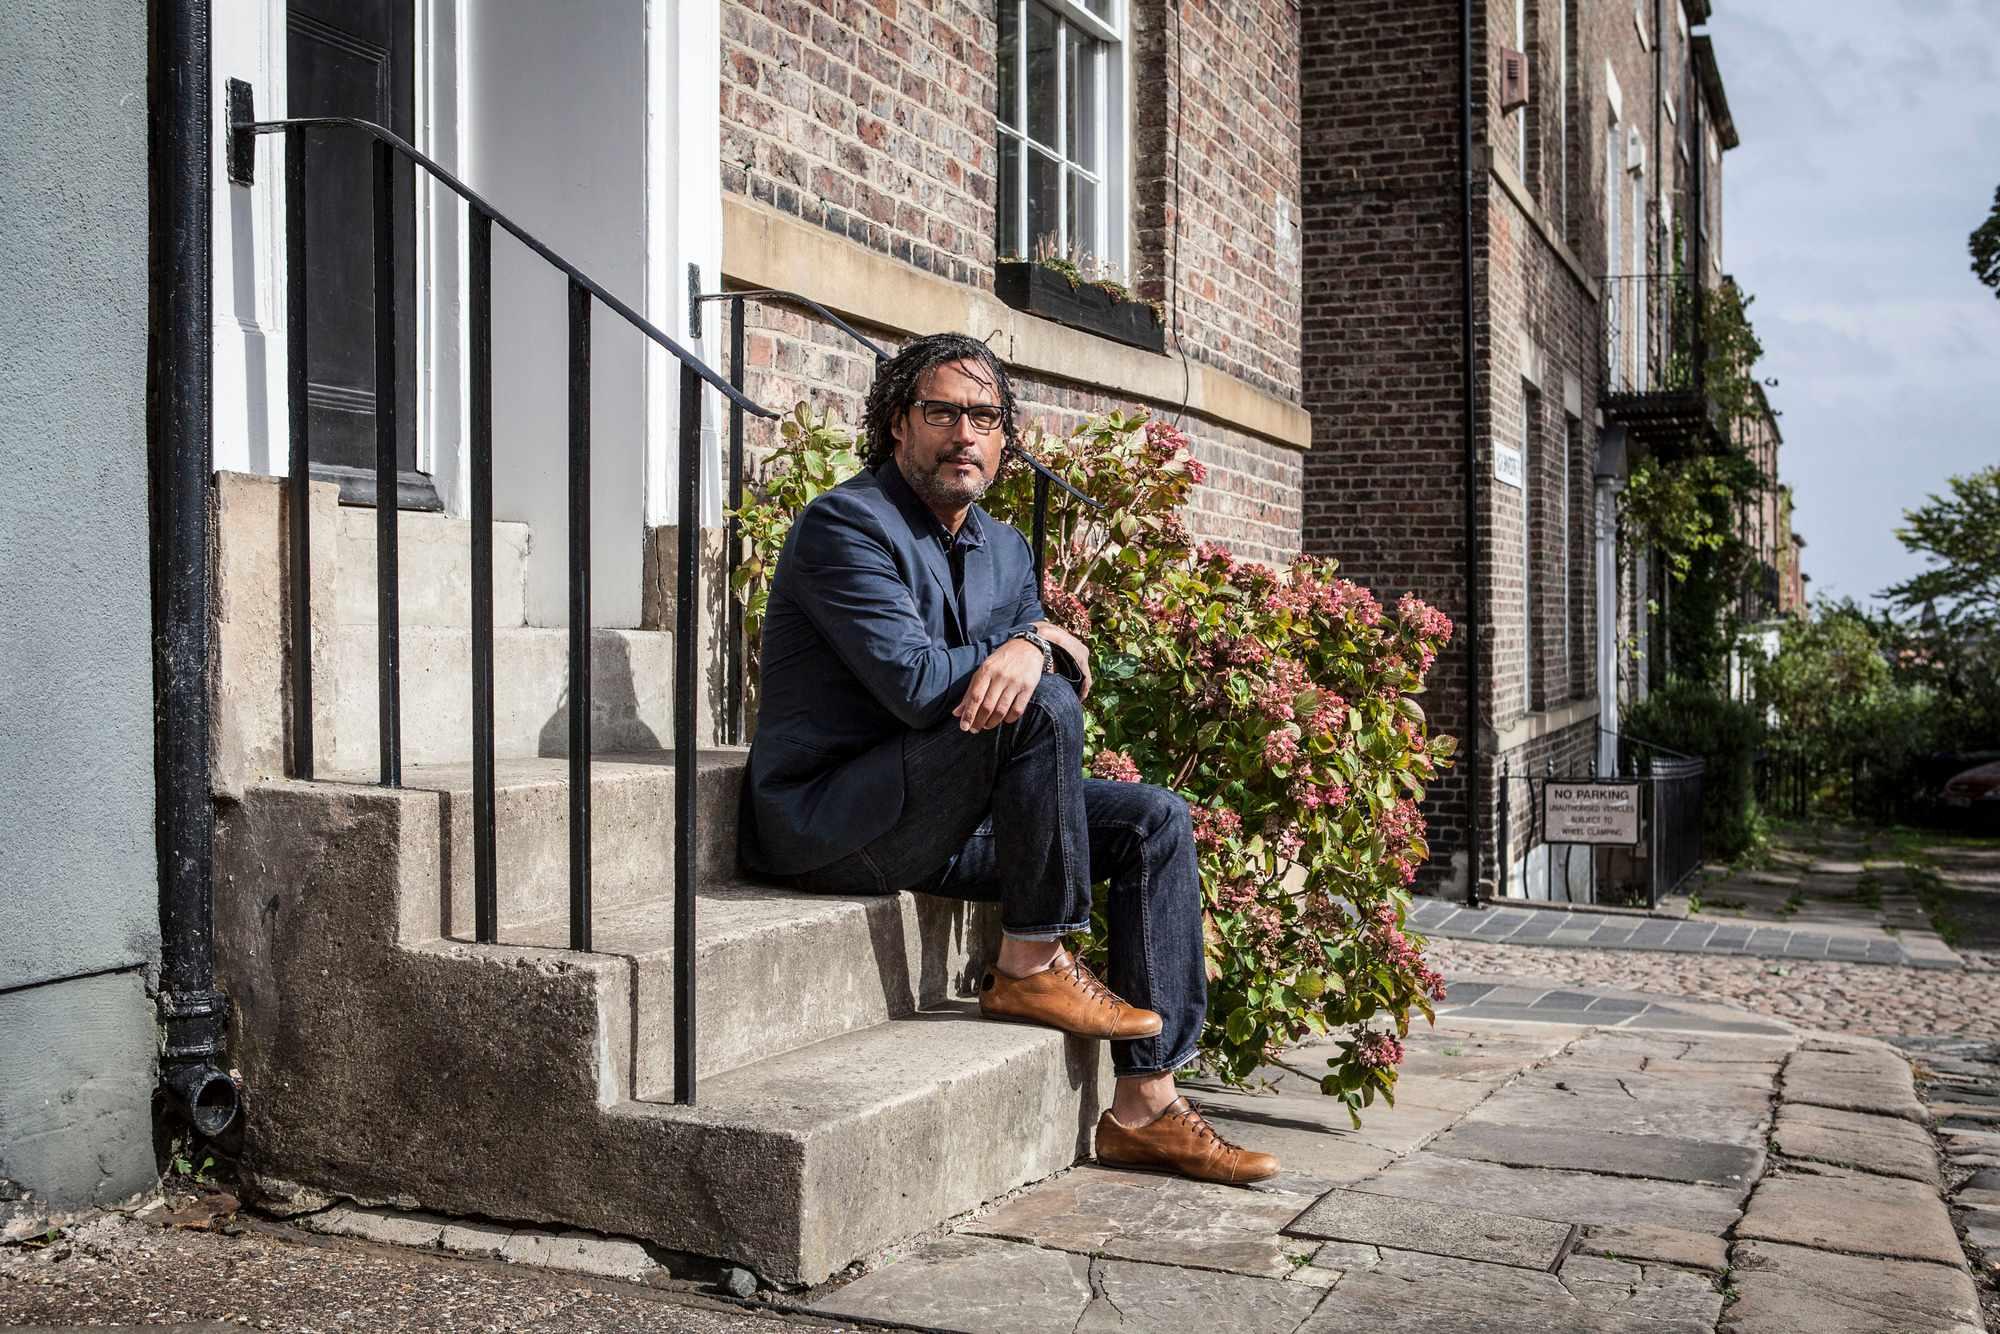 Historian David Olusoga outside Ravensworth Terrace in Newcastle upon Tyne (BBC)